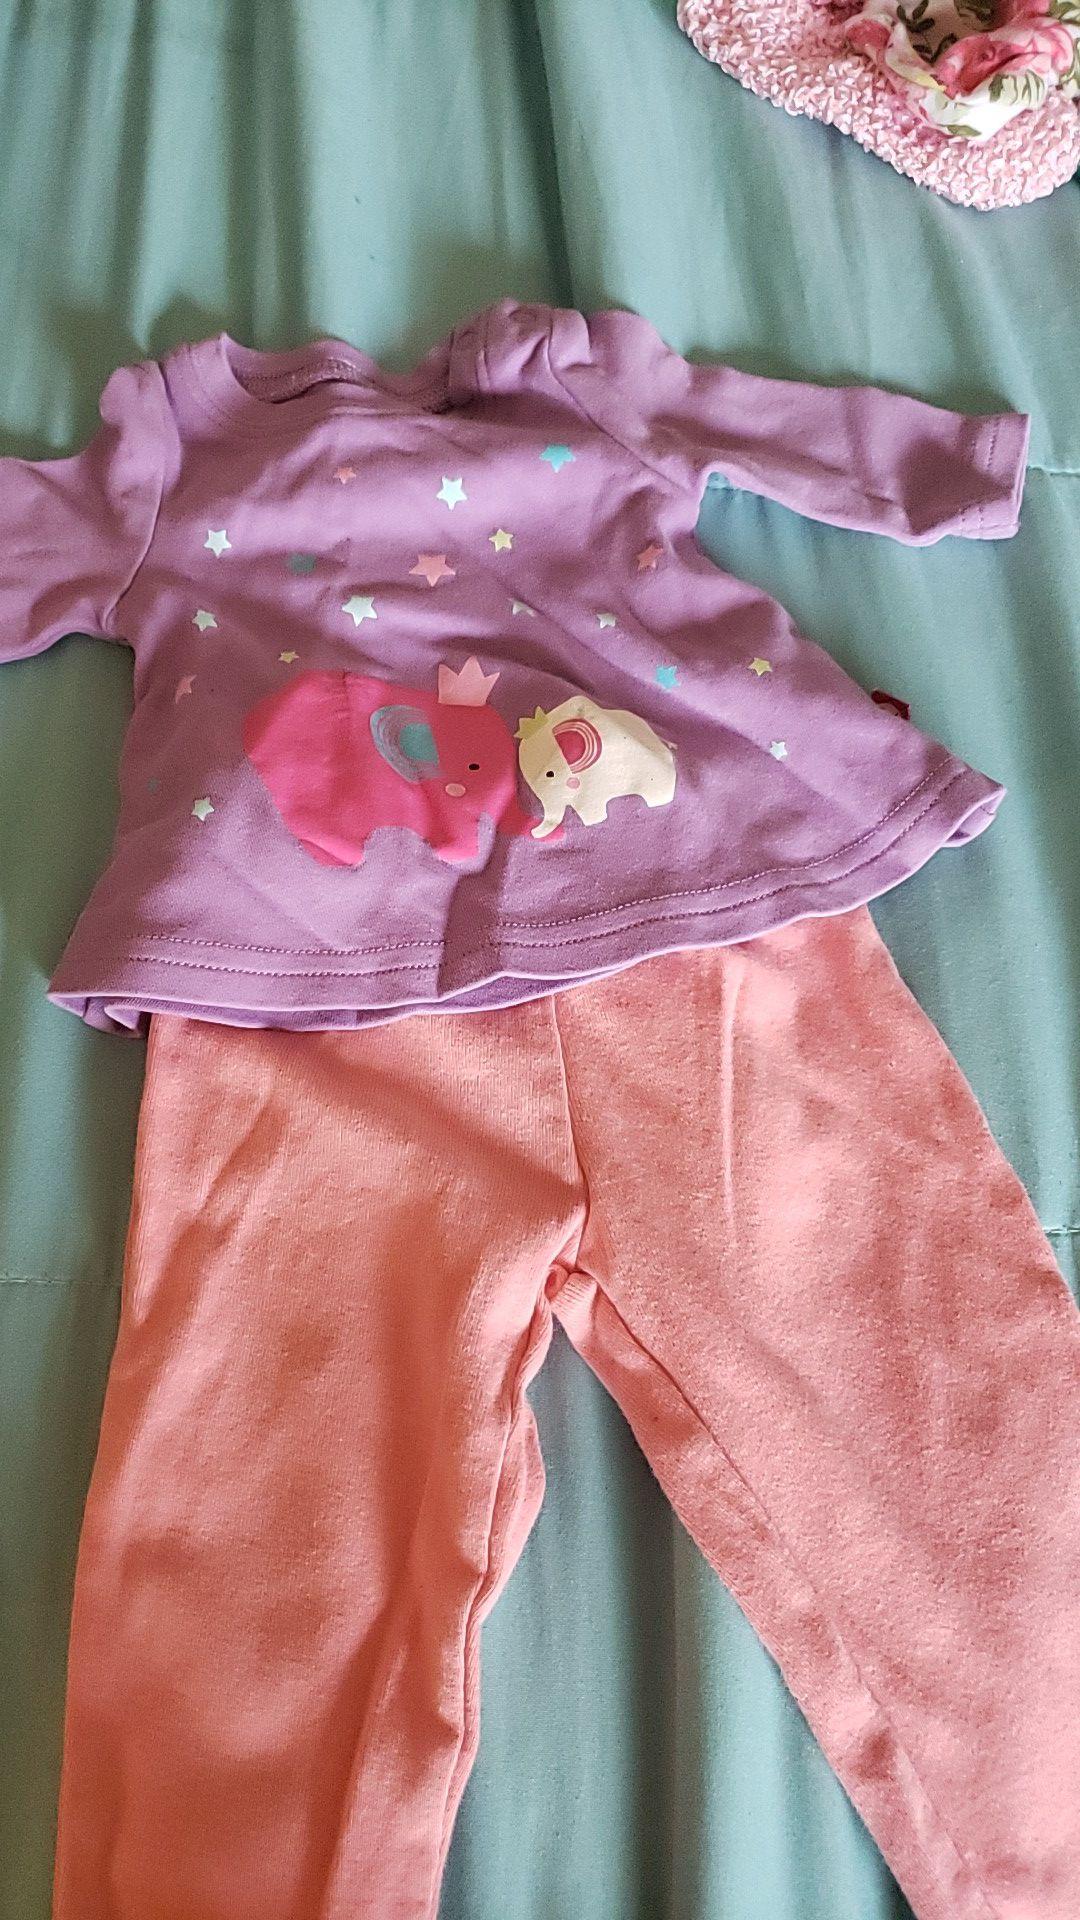 Baby Girl set of Clothing 3-6M